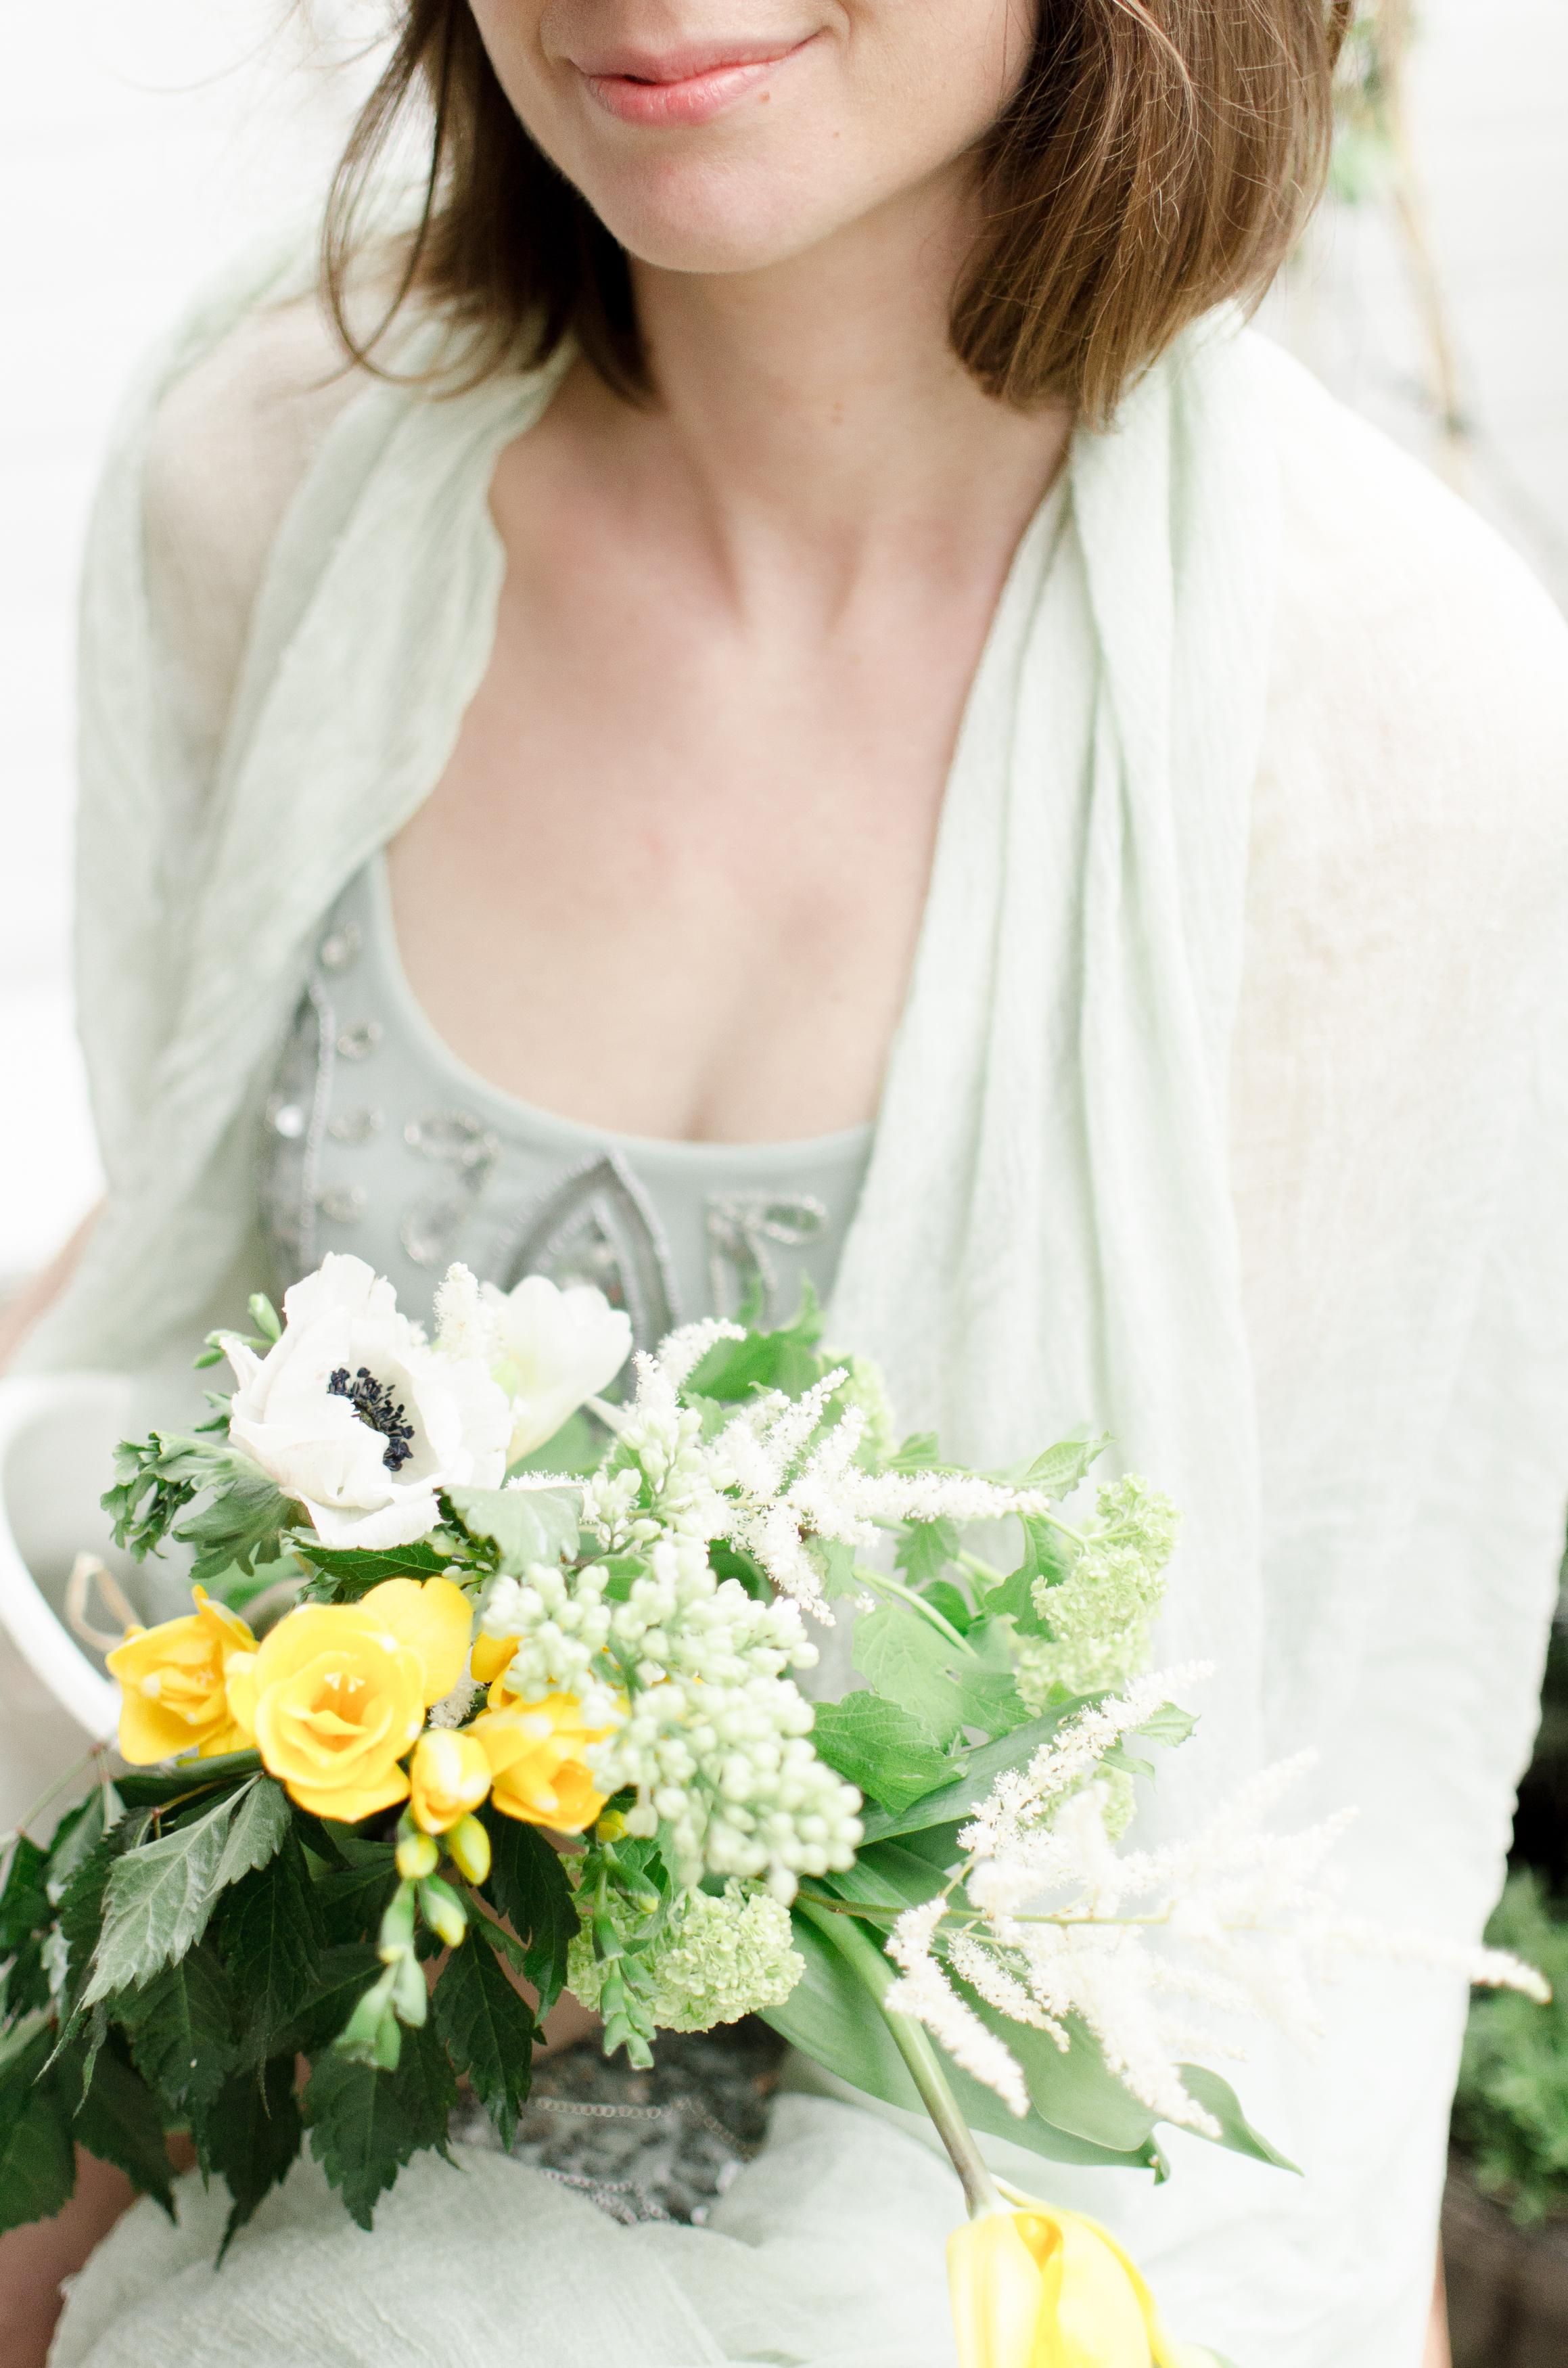 Clare Bernard - Joana Senkute Photography.